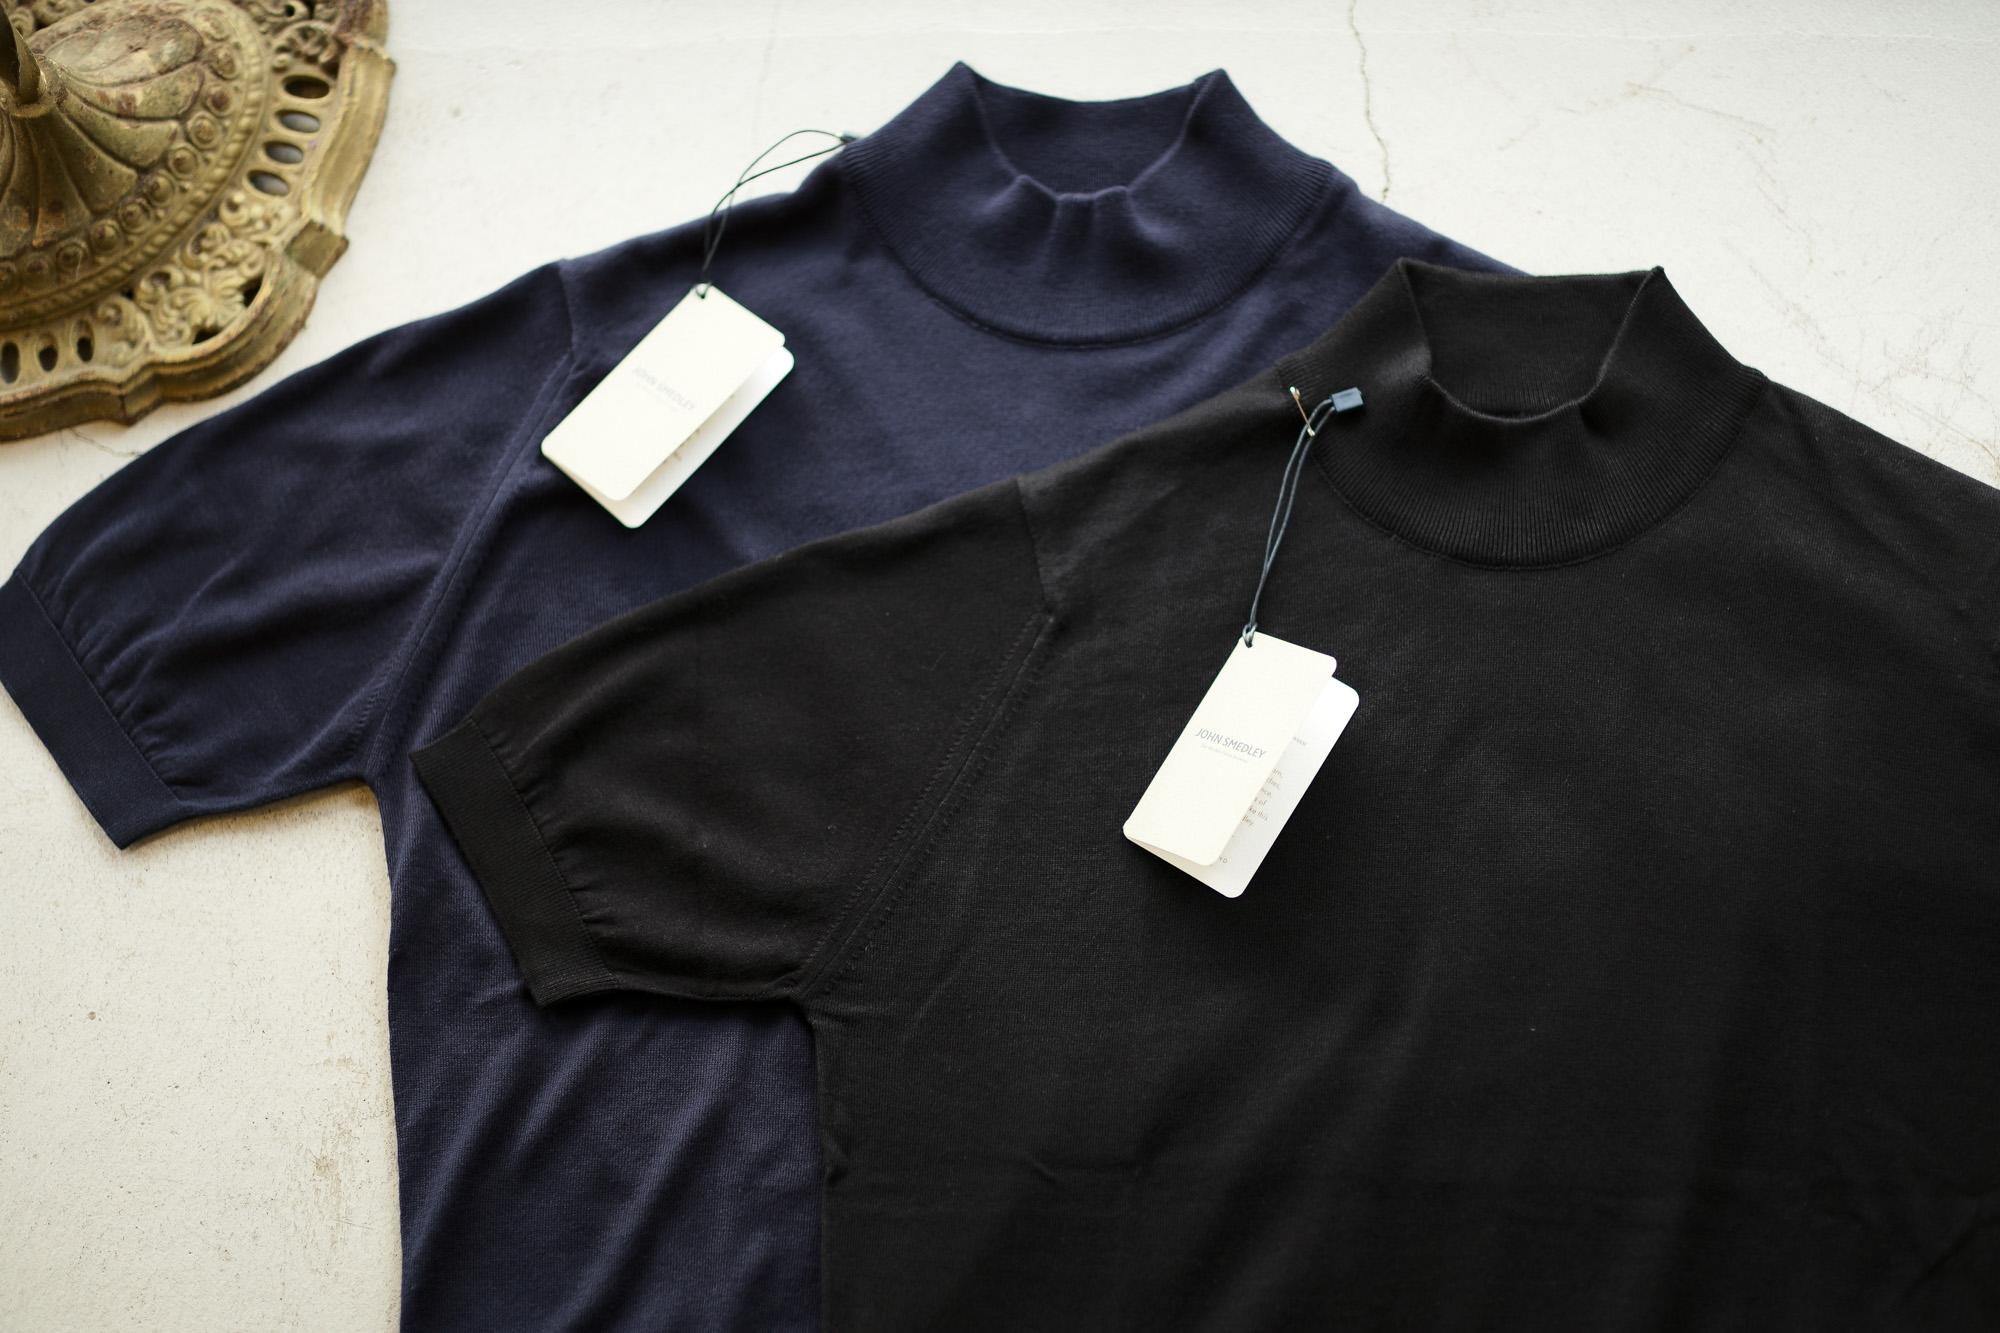 JOHN SMEDLEY (ジョンスメドレー) S3813 Mock neck T-shirt SEA ISLAND COTTON (シーアイランドコットン) コットンニット モックネック Tシャツ NAVY (ネイビー) , BLACK (ブラック) Made in England (イギリス製) 2019 春夏新作 johnsmedley 愛知 名古屋 altoediritto アルトエデリット